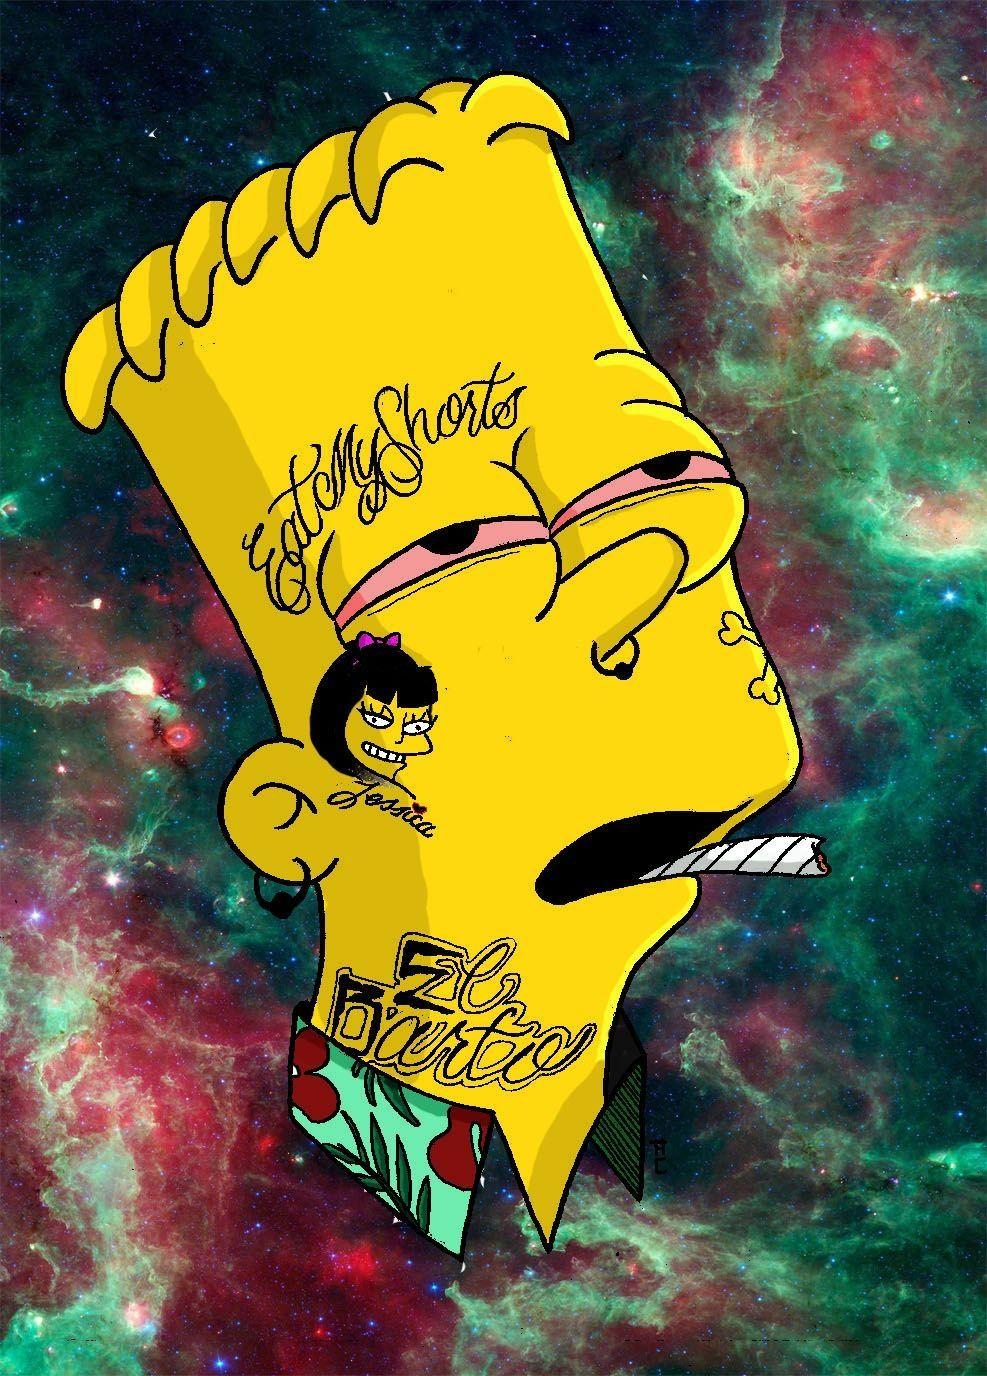 Bart Simpson Supreme Wallpapers Wallpaper Cave For The Incredible The Simpsons Wallpaper Bart Simpsons Drawings Simpsons Art Bart Simpson Drawing